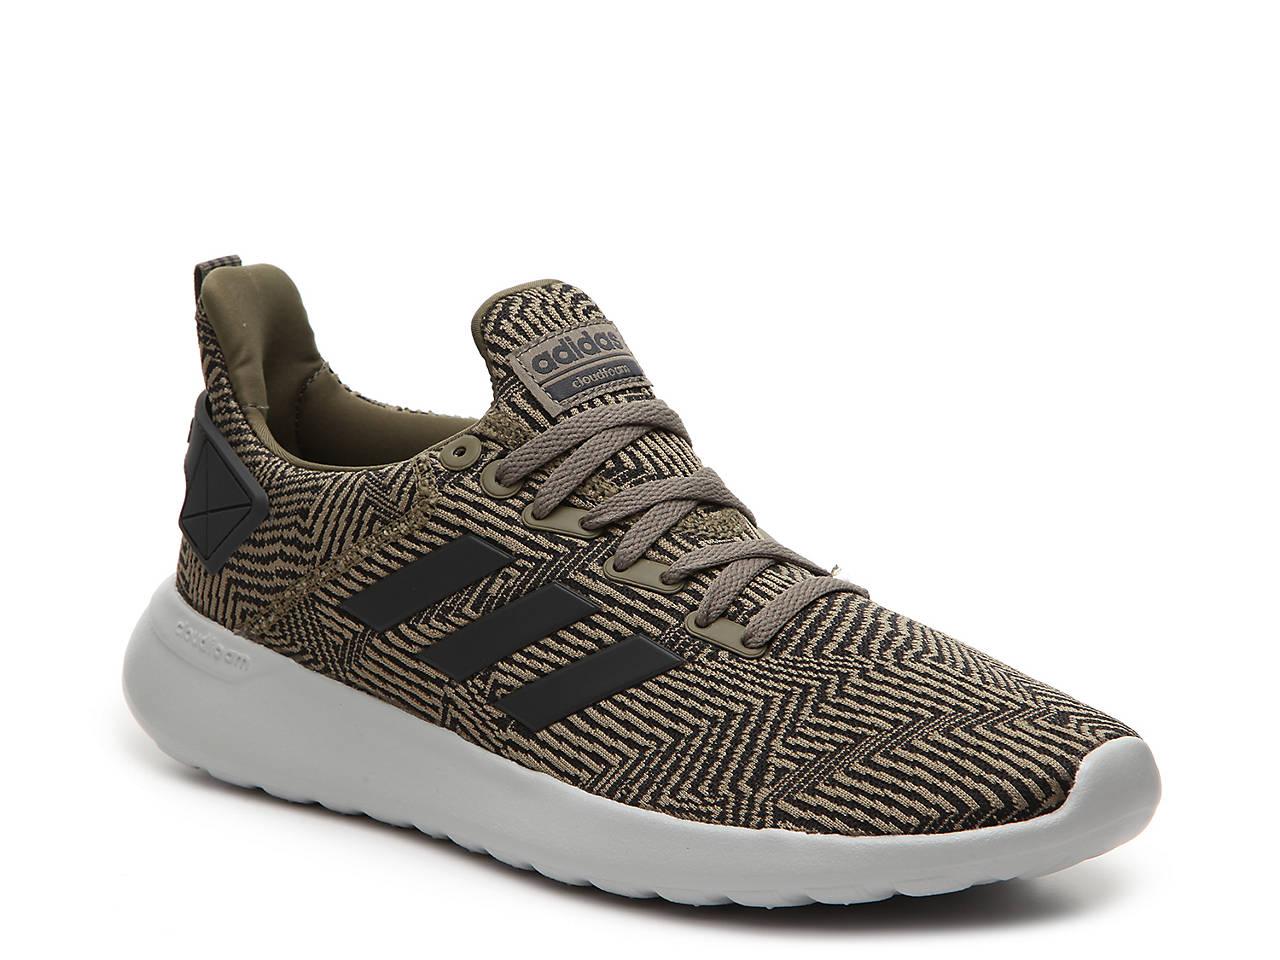 93b1536cf9997d adidas Lite Racer BYD Sneaker - Men s Men s Shoes